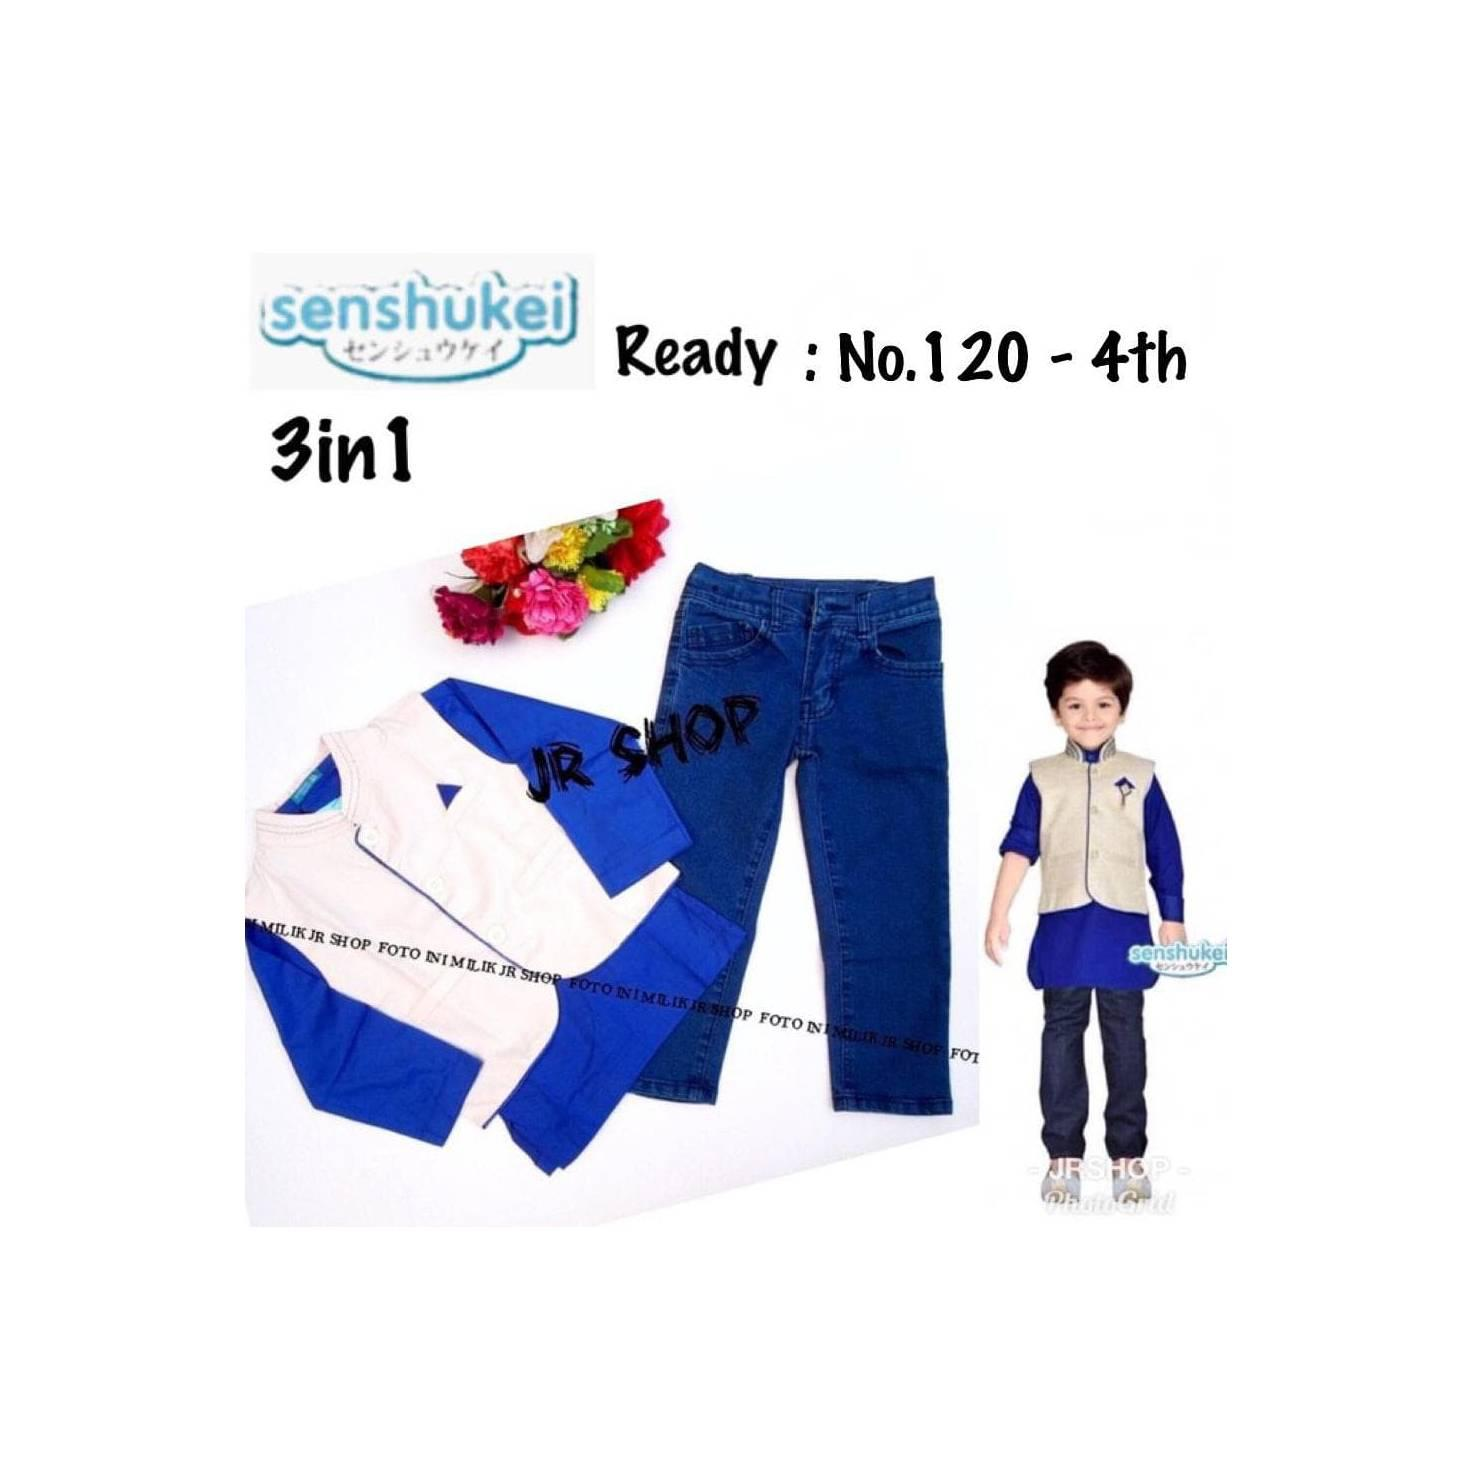 List Harga Baju Koko Anak 2 Tahun Termurah Daftar Fashion Setelan Rbj477 Ready Senshukei 3in1 7 Import